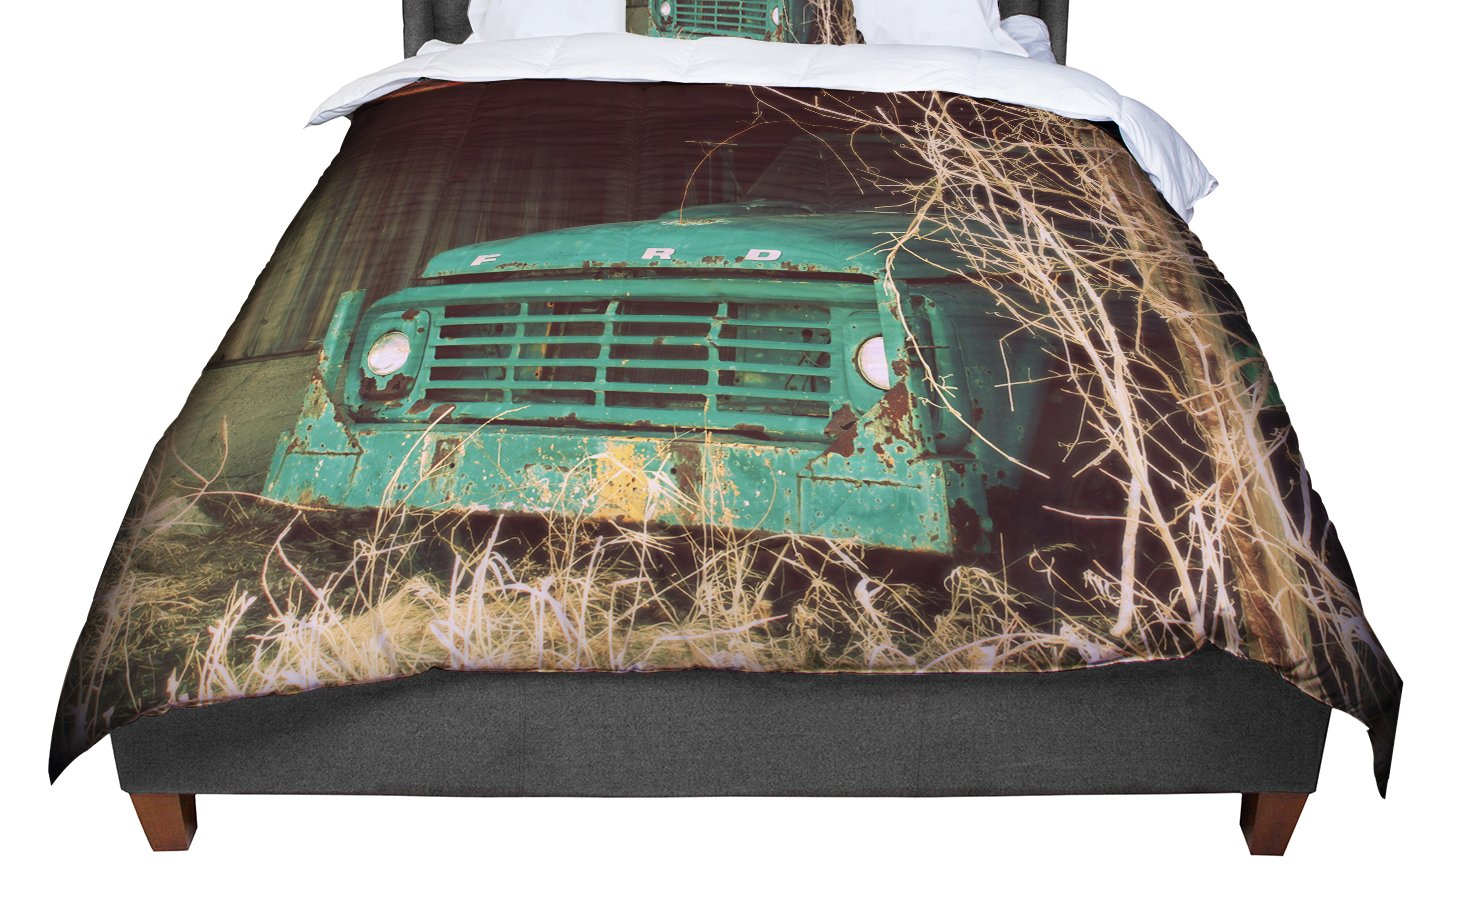 Cal King Comforter 104 X 88 KESS InHouse Angie Turner Ford Teal Car King